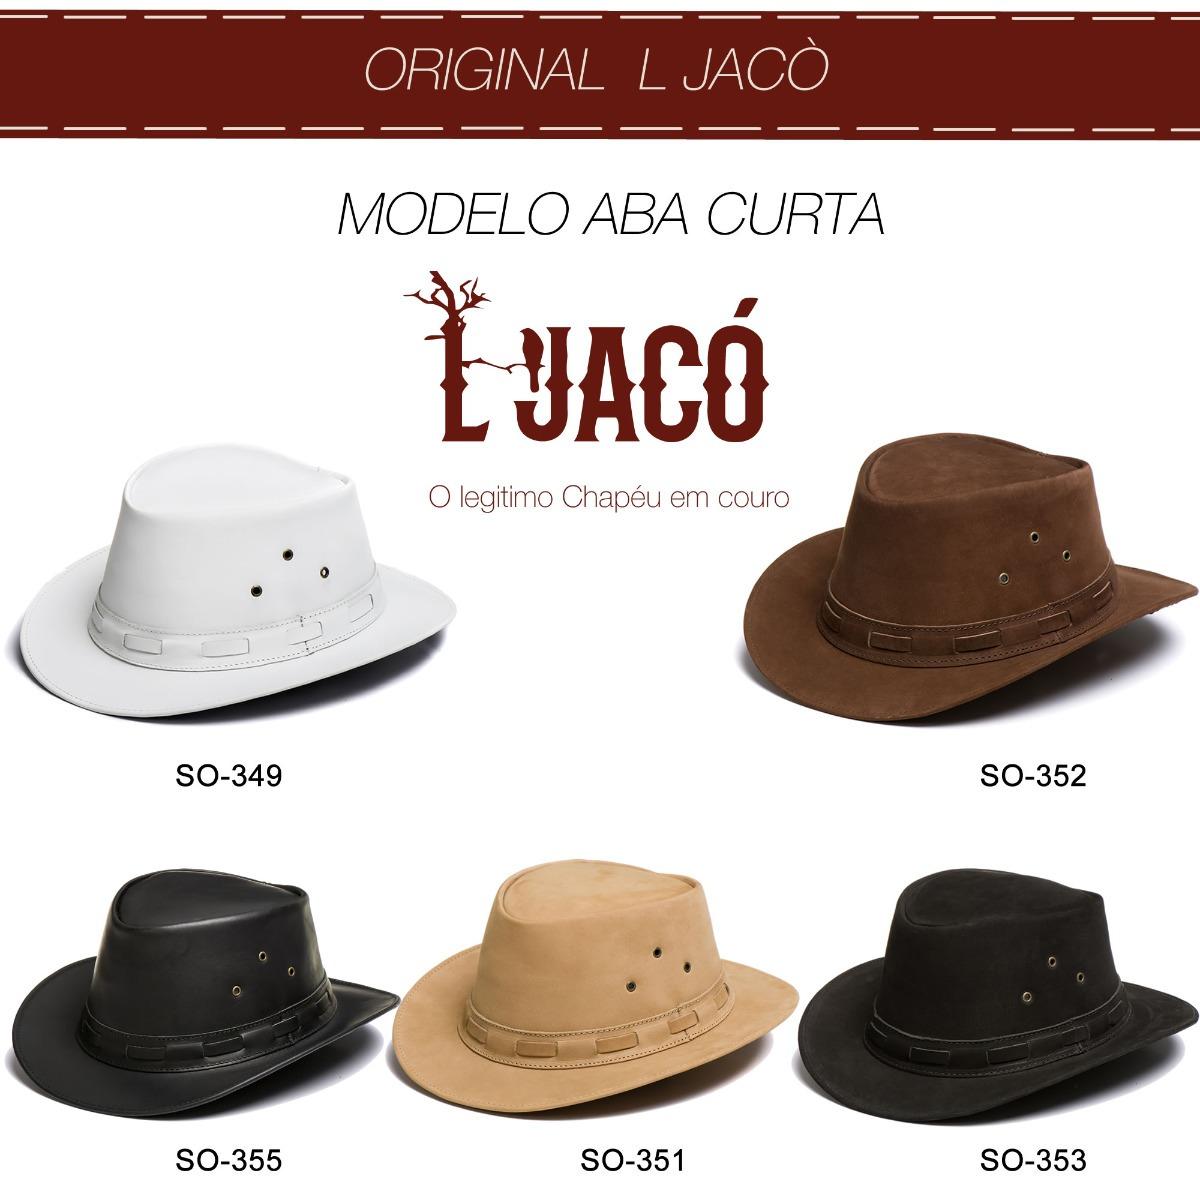 Chapeu Em Couro Legitimo Aba Curta Areia L Jacó So-351 - R  150 5f5f006e7d0